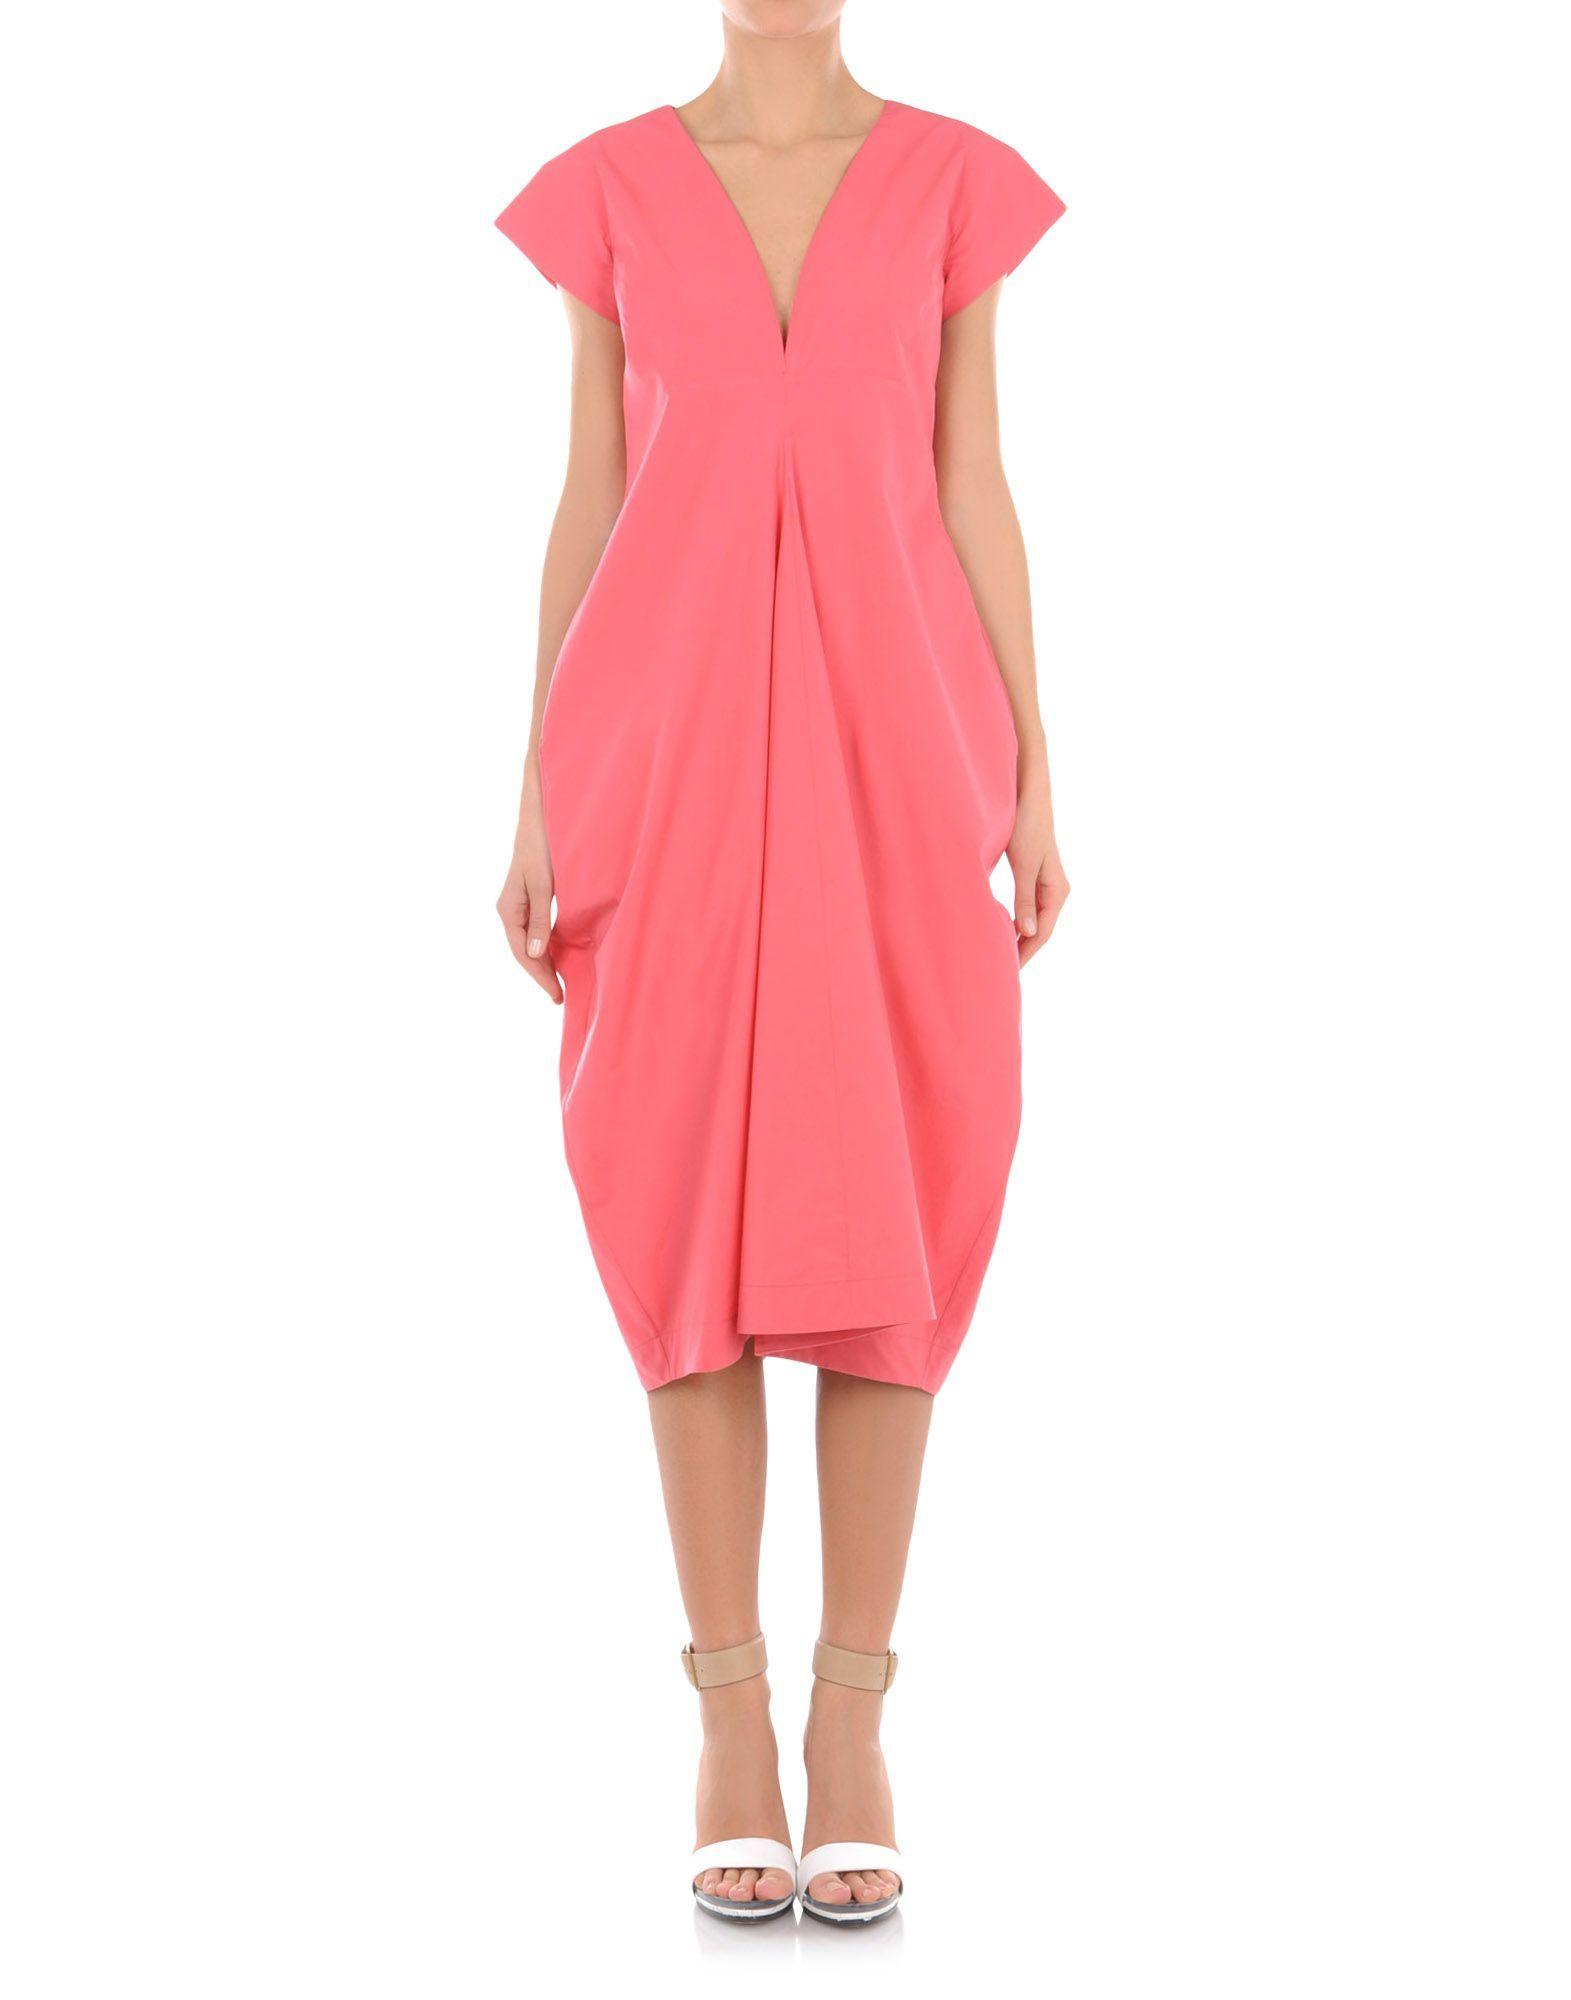 Jil sander dresses length dress women clothes pinterest